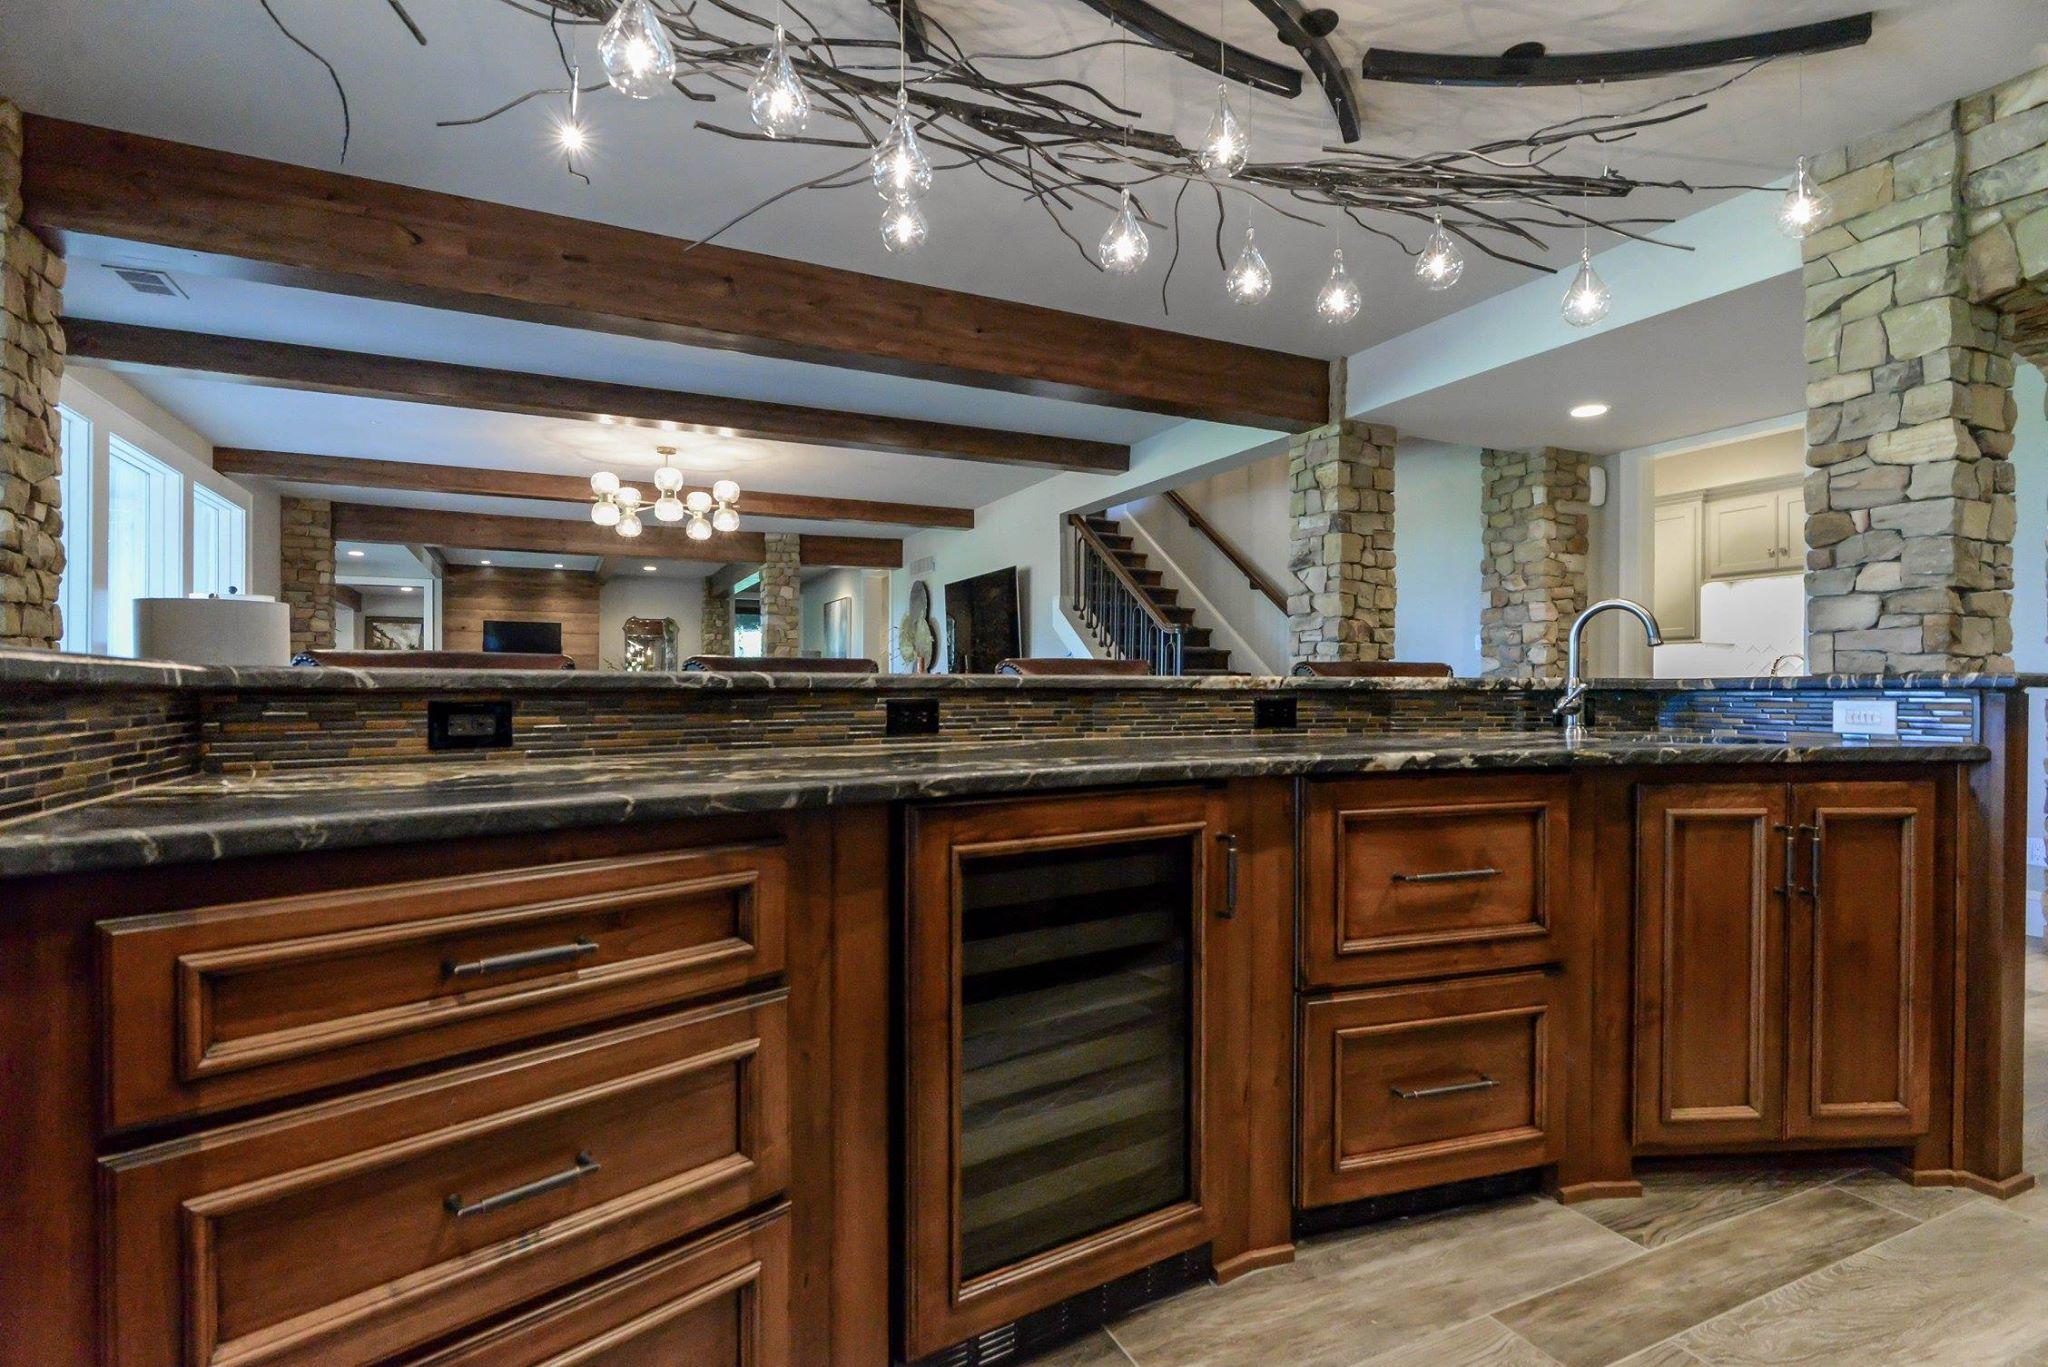 Custom cabinets and bar work